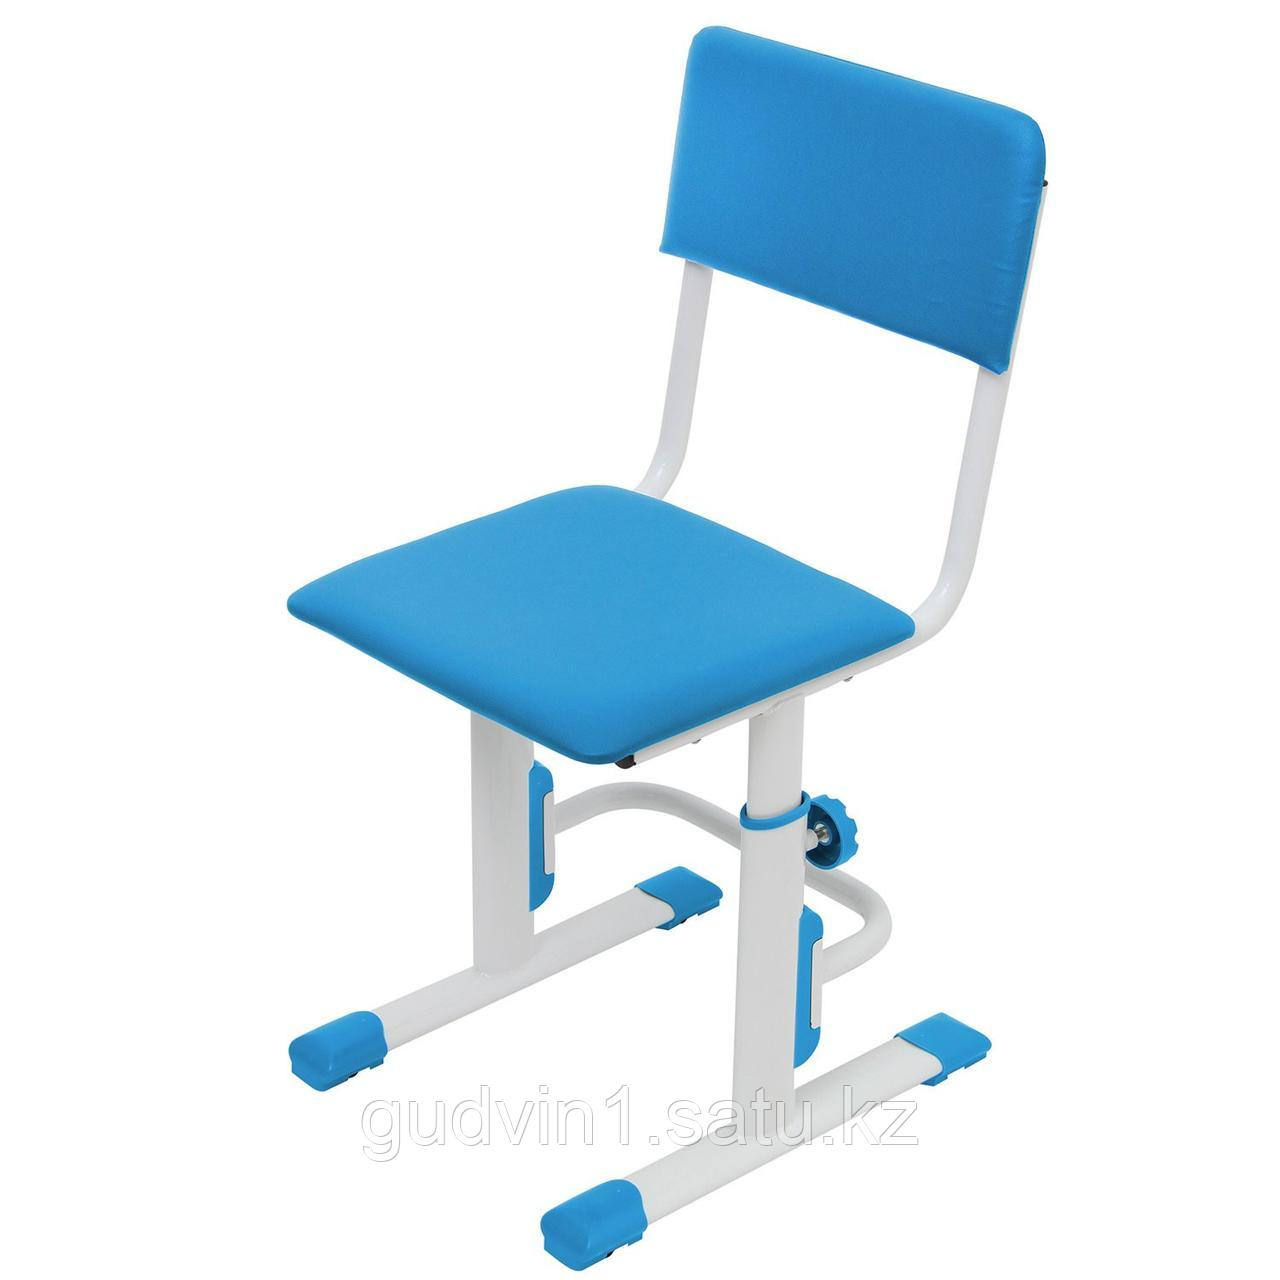 Стул для школьника регулируемый Polini City / Polini Smart L, белый-синий 01-00192